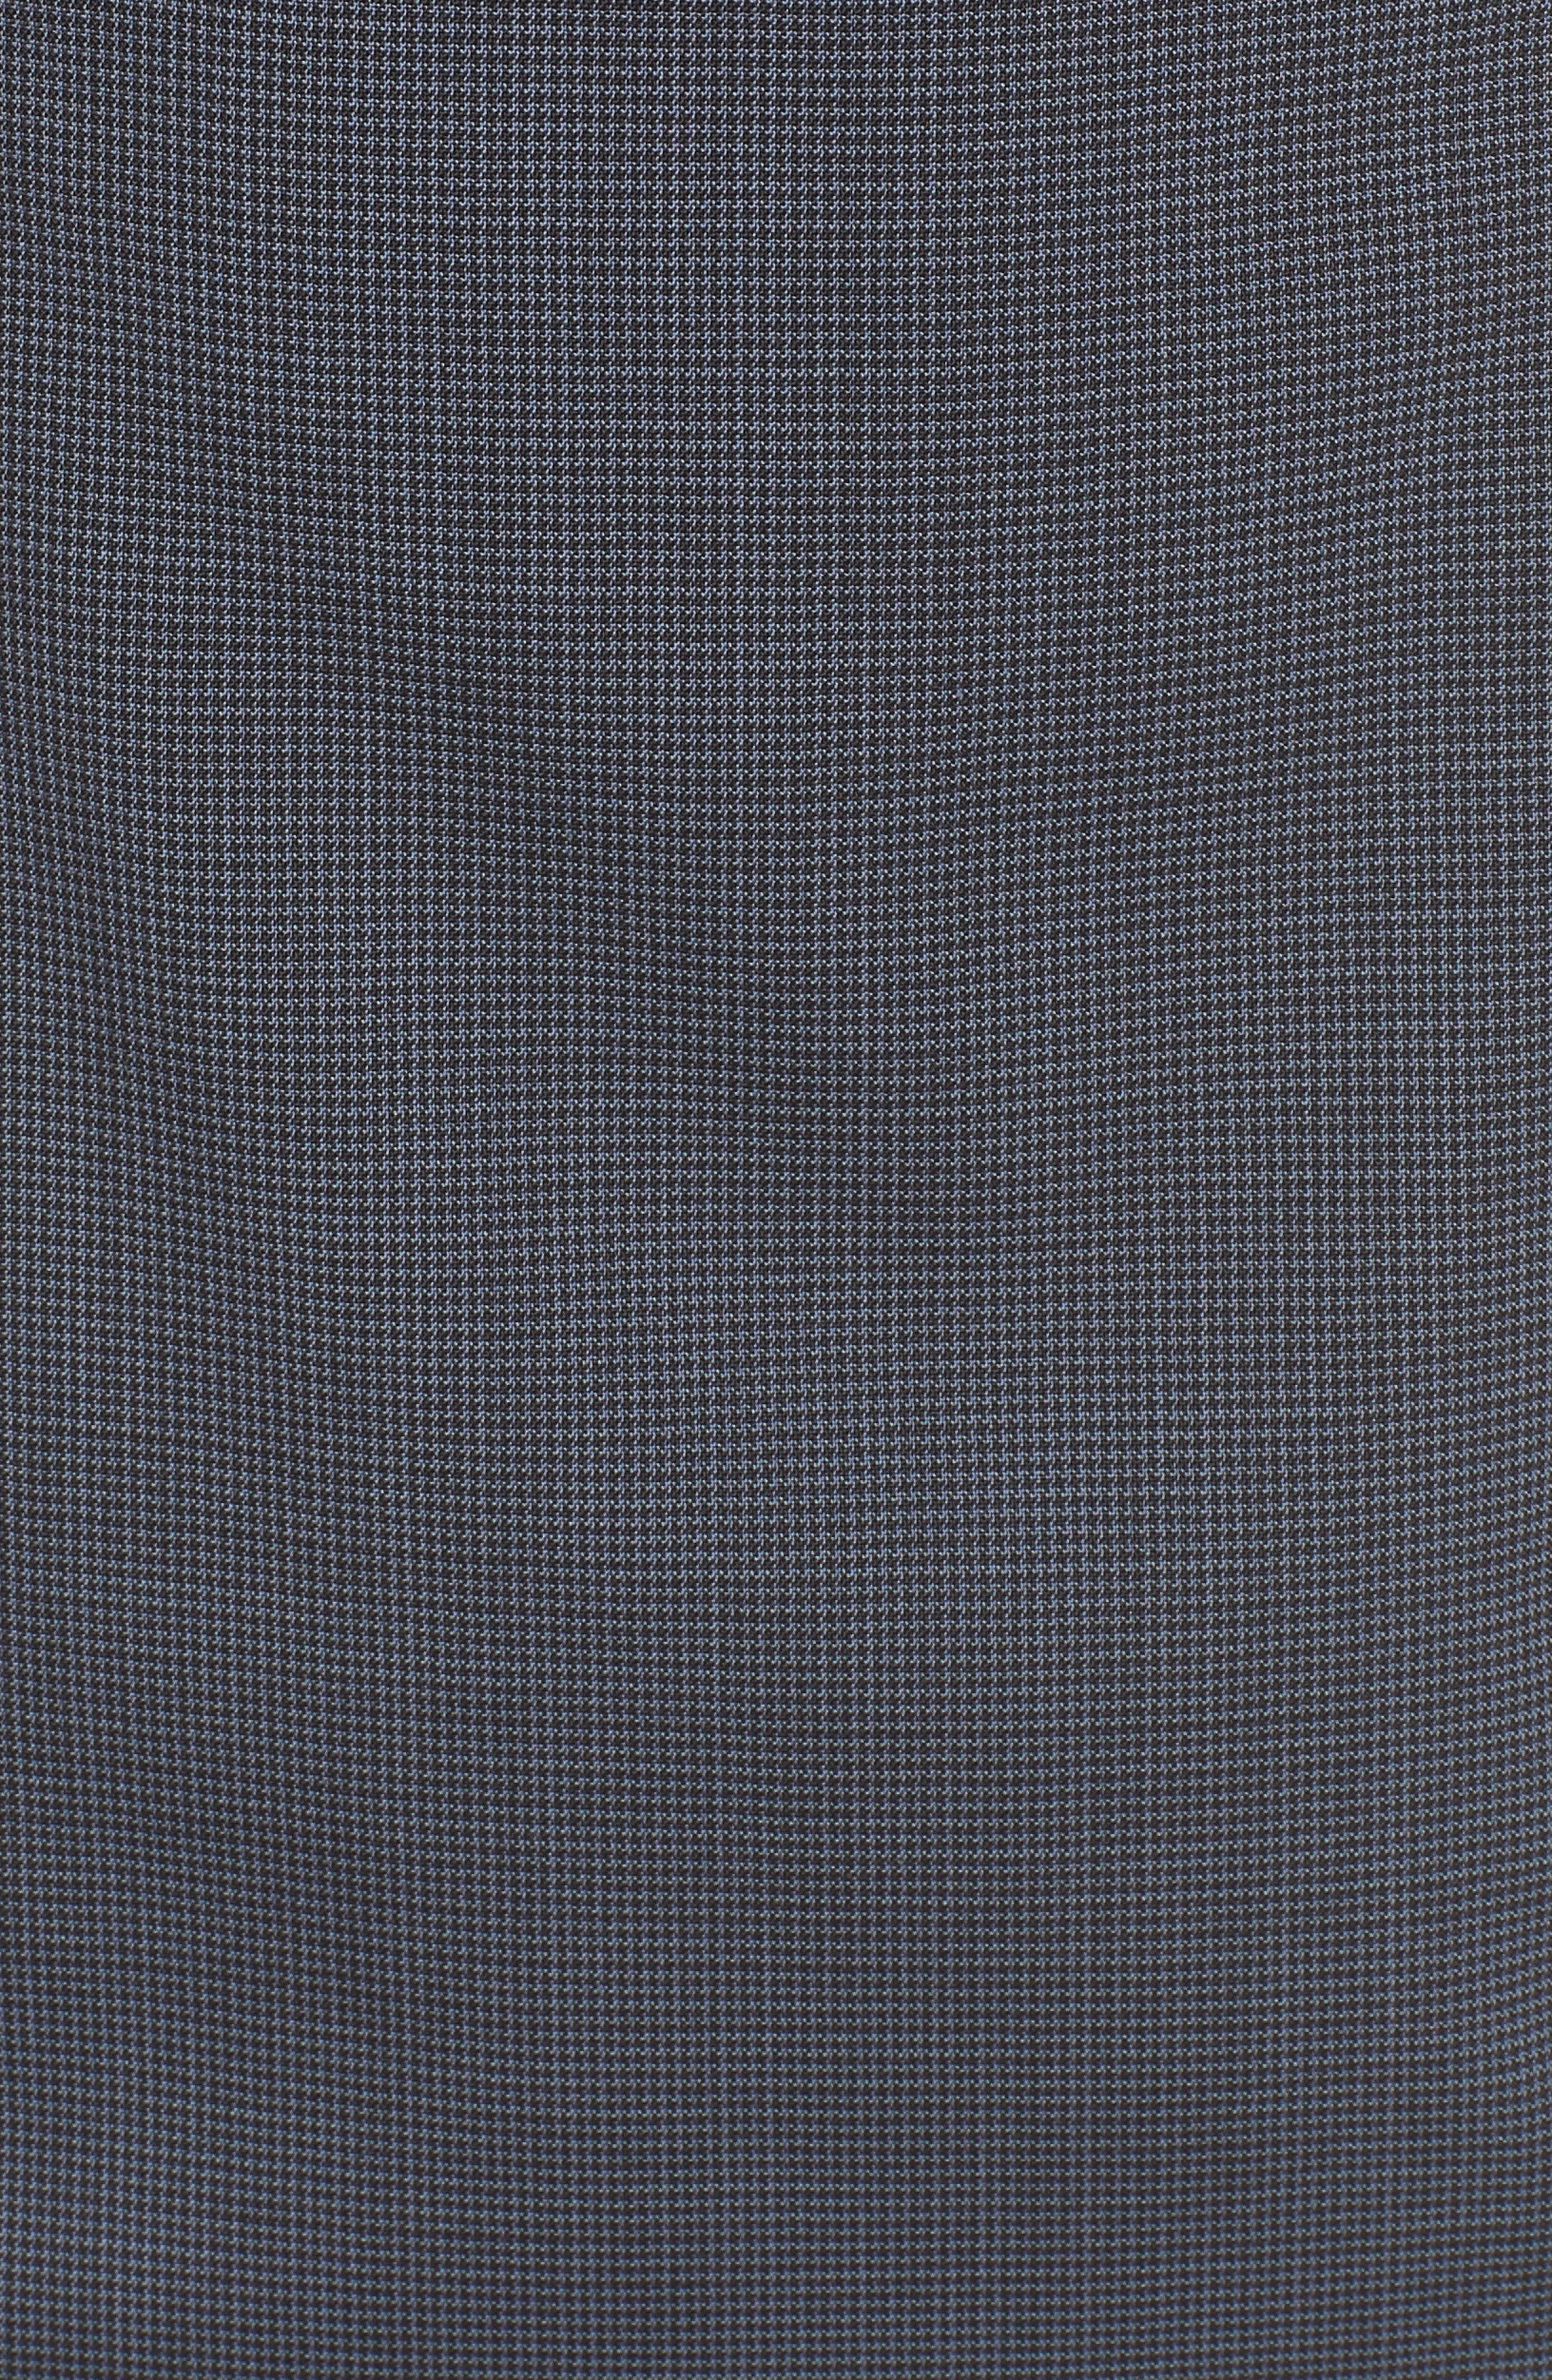 Dalouise Pepita Stretch Wool Sheath Dress,                             Alternate thumbnail 5, color,